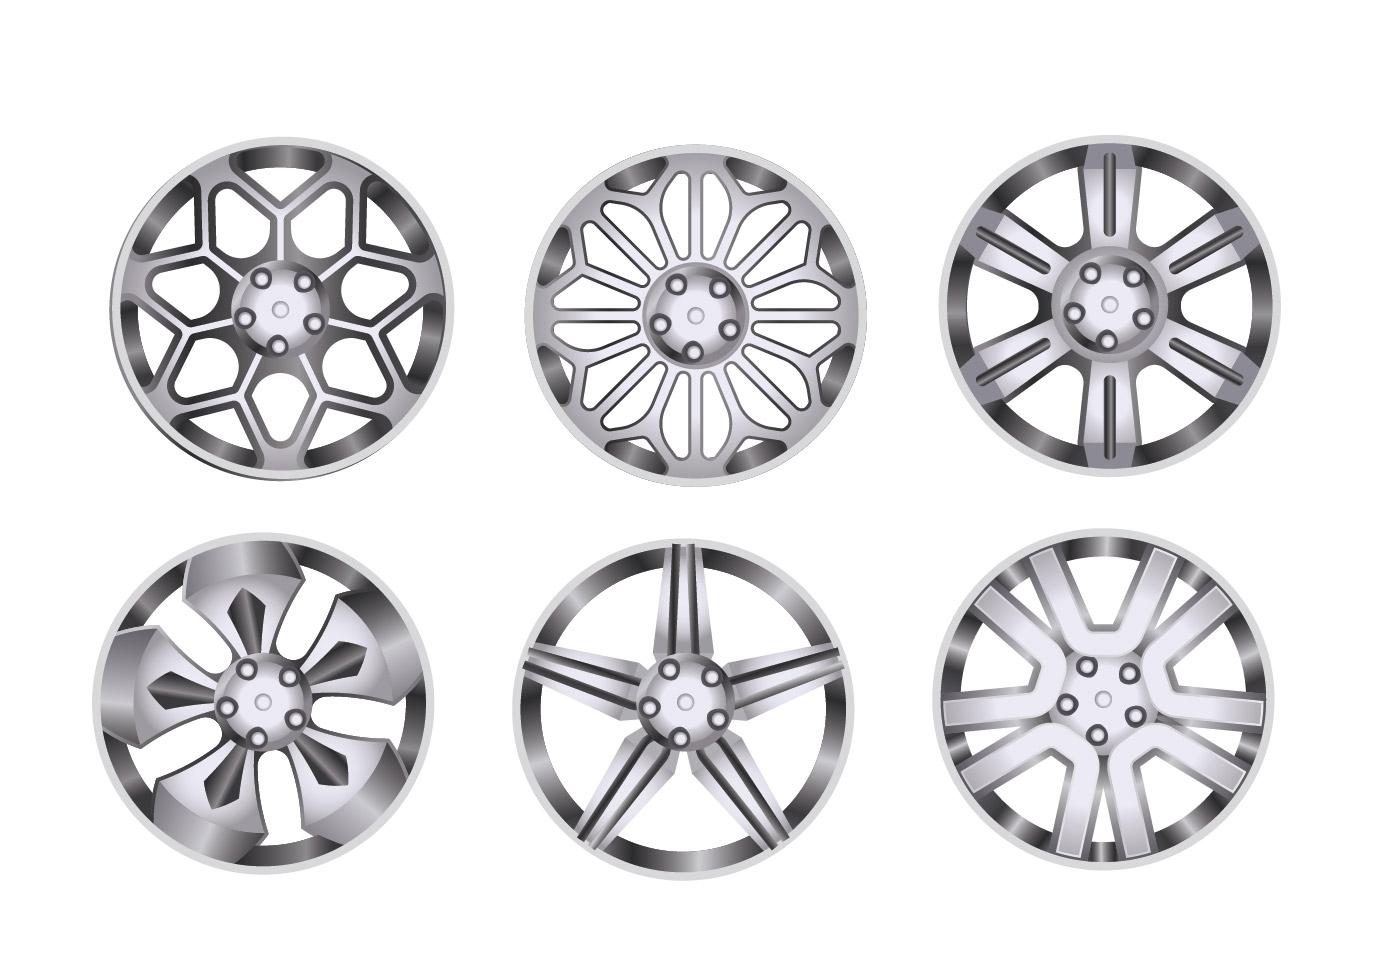 Hot Wheels Cars Free Vector Art